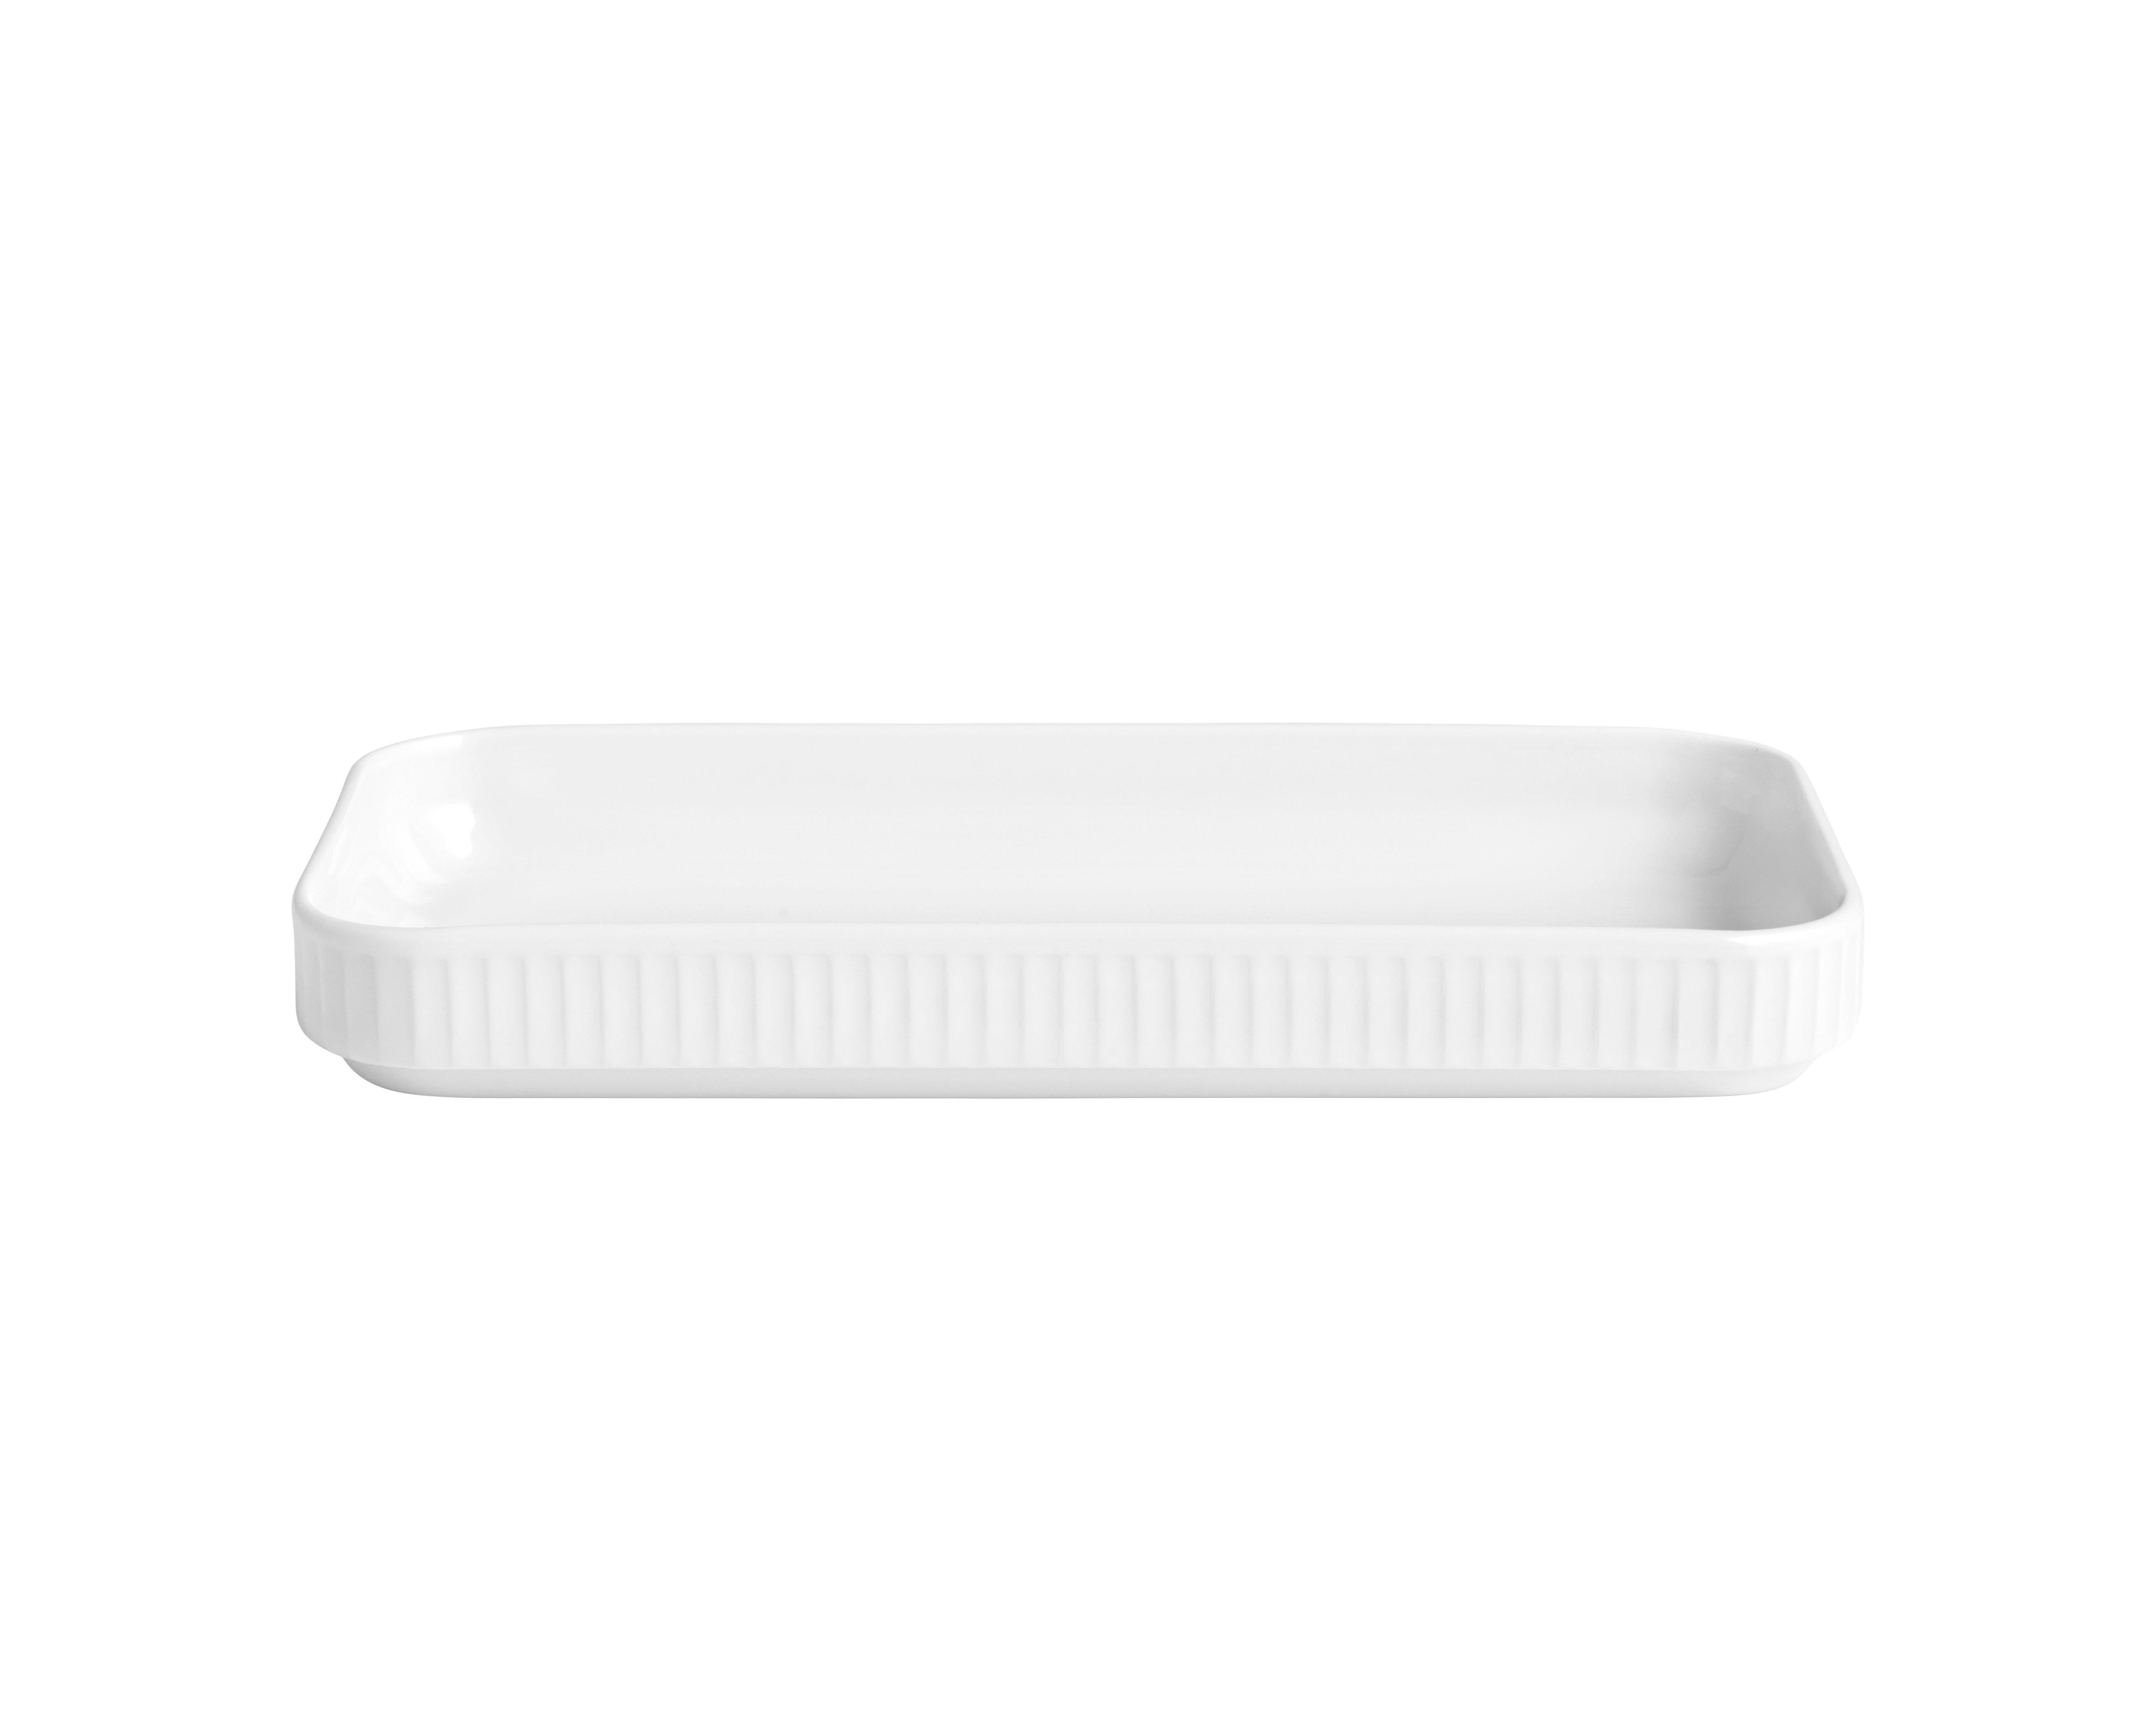 Pillivuyt - Plissé Tapas Dish 24 cm - White (224224)